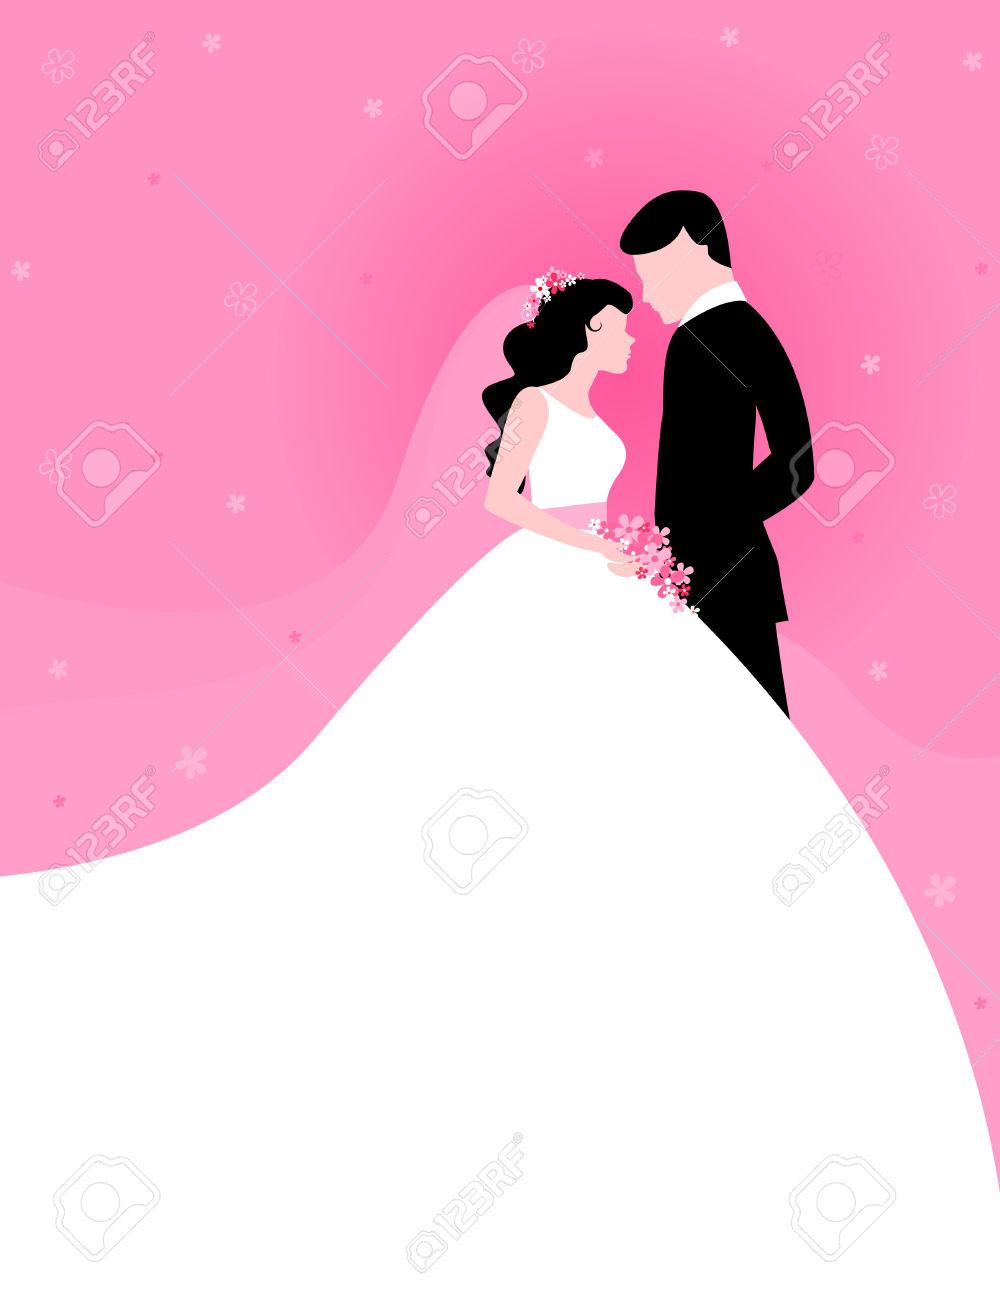 Bridal Clip Art Images | Clipart Panda - Free Clipart Images